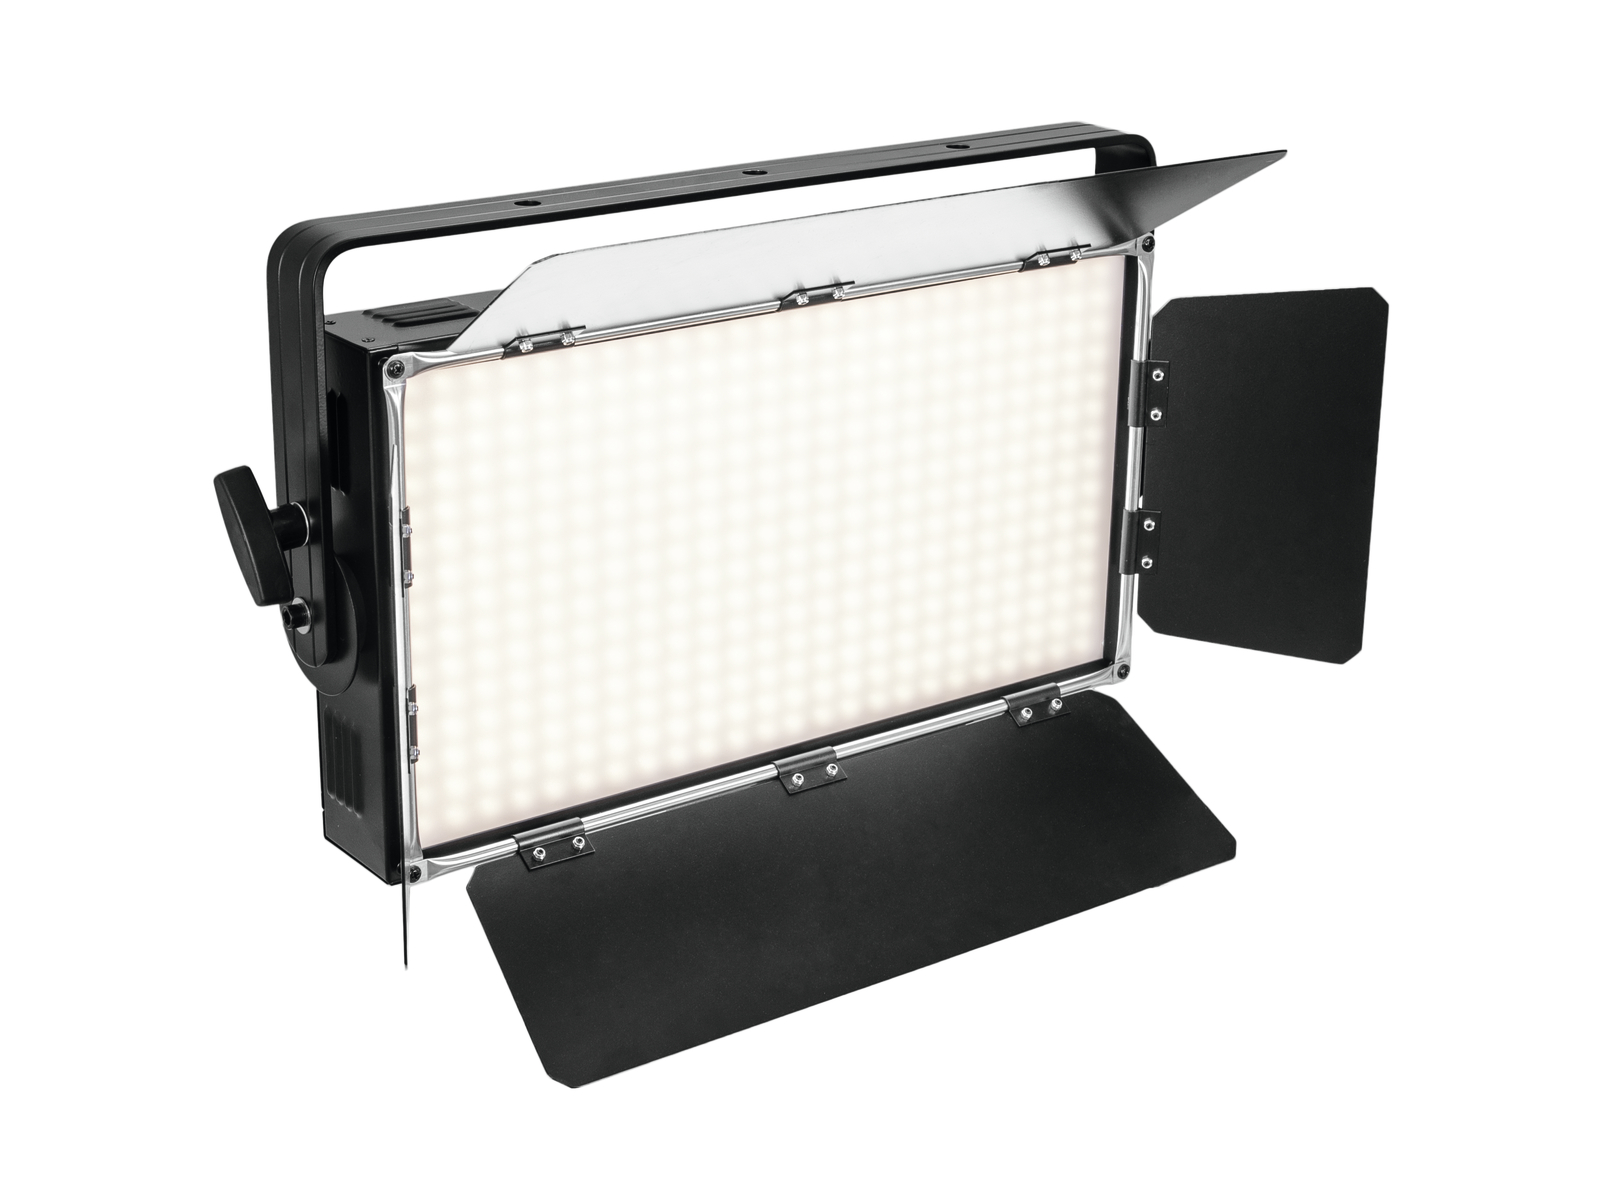 Eurolite LED PLL-360 LED reflektor, 6000K